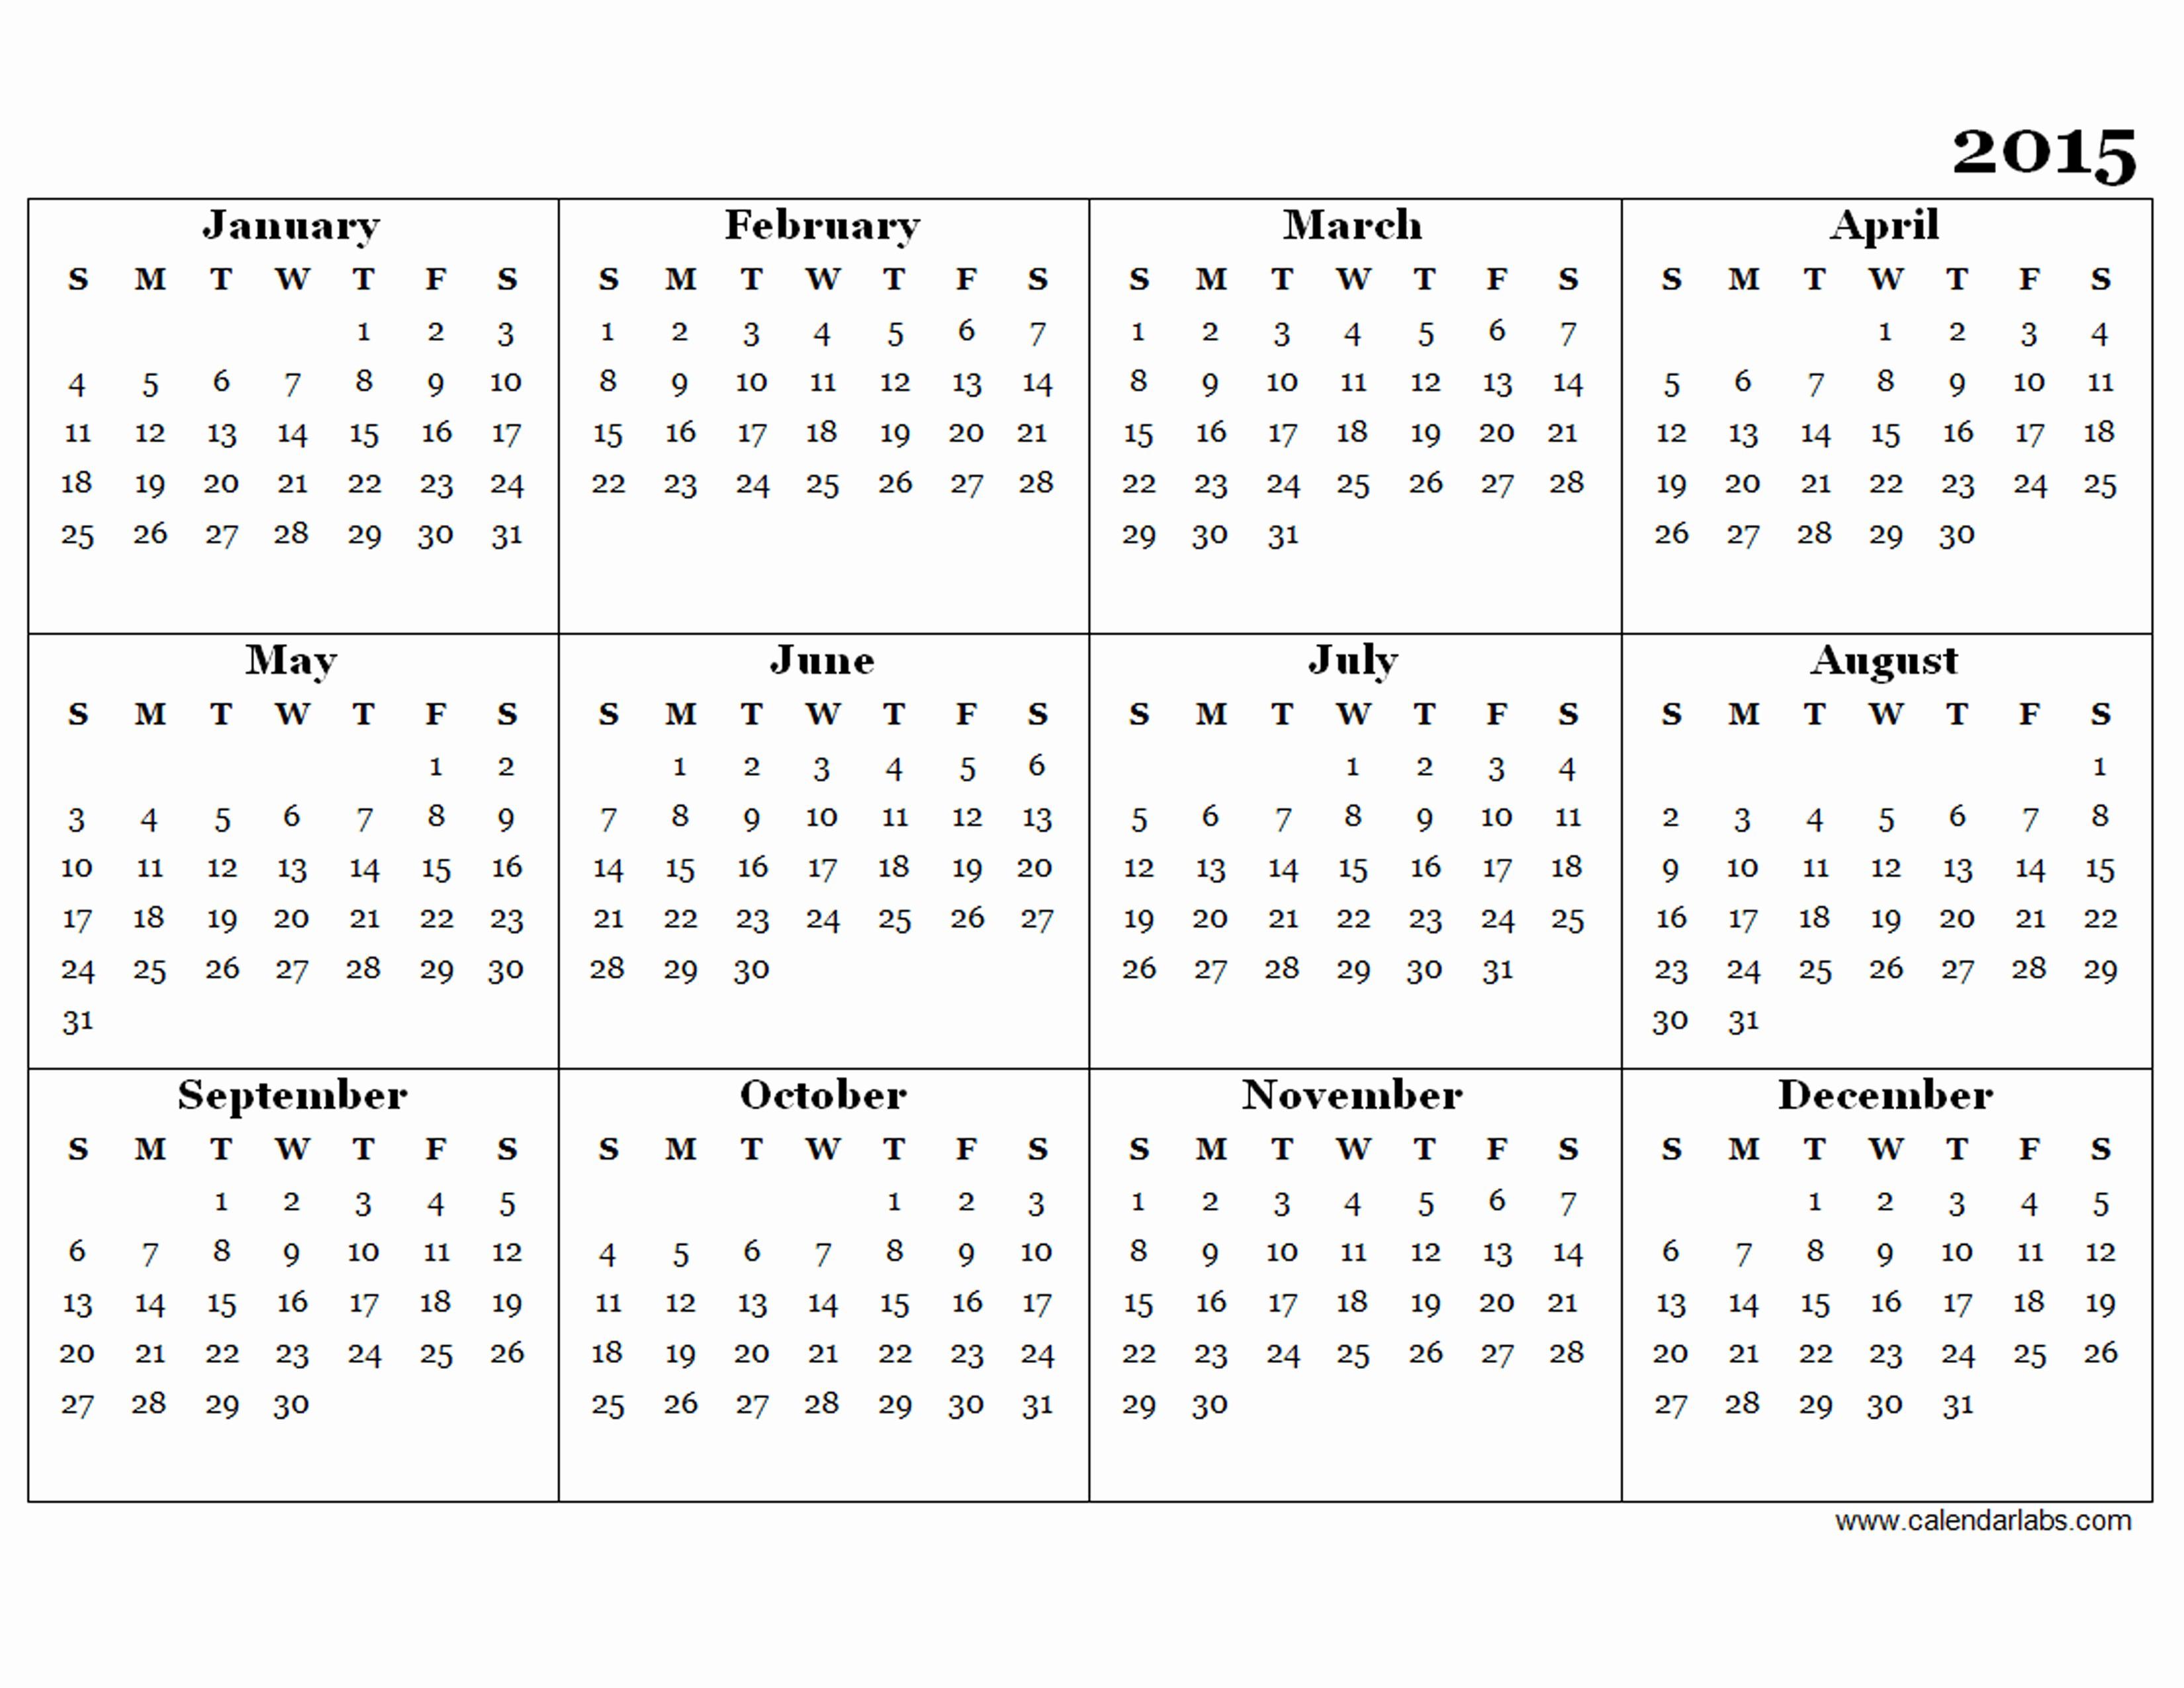 2015 Yearly Calendar Printable Landscape Beautiful Calendar Template 2015 Calendar Labsml